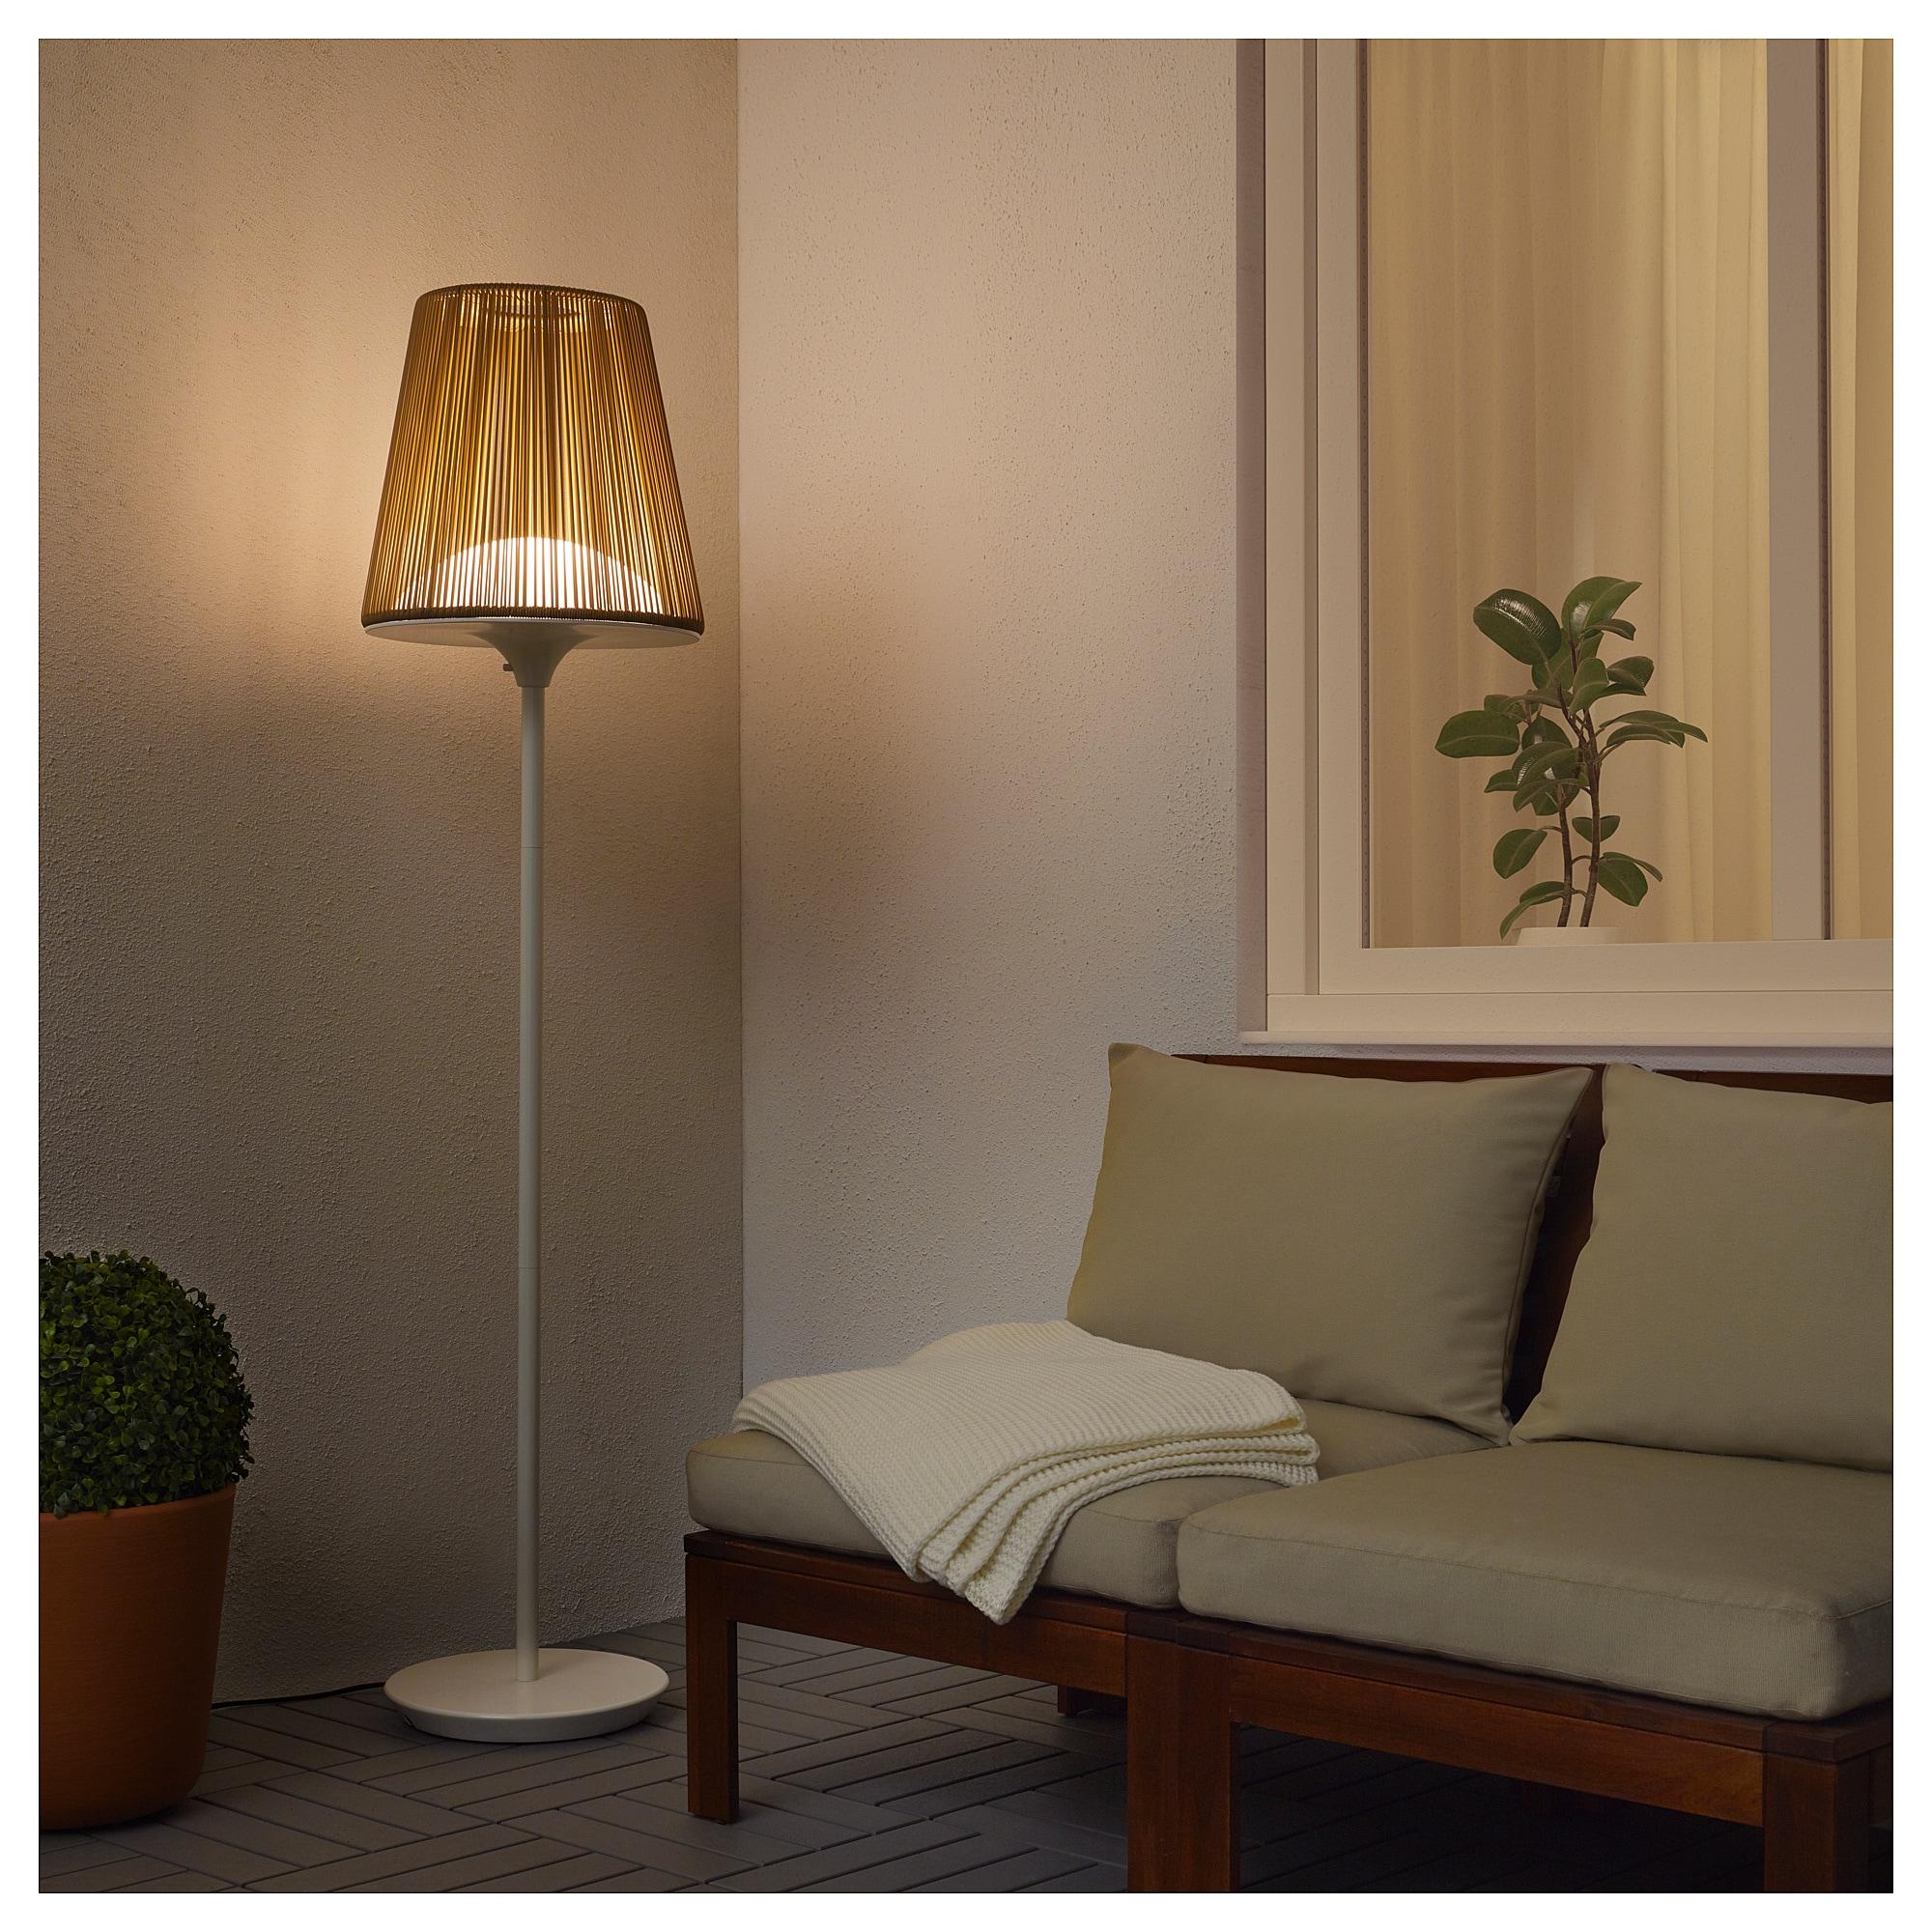 Ikea Mullbacka Floor Lamp Outdoor Floor Lamp Floor Lamp